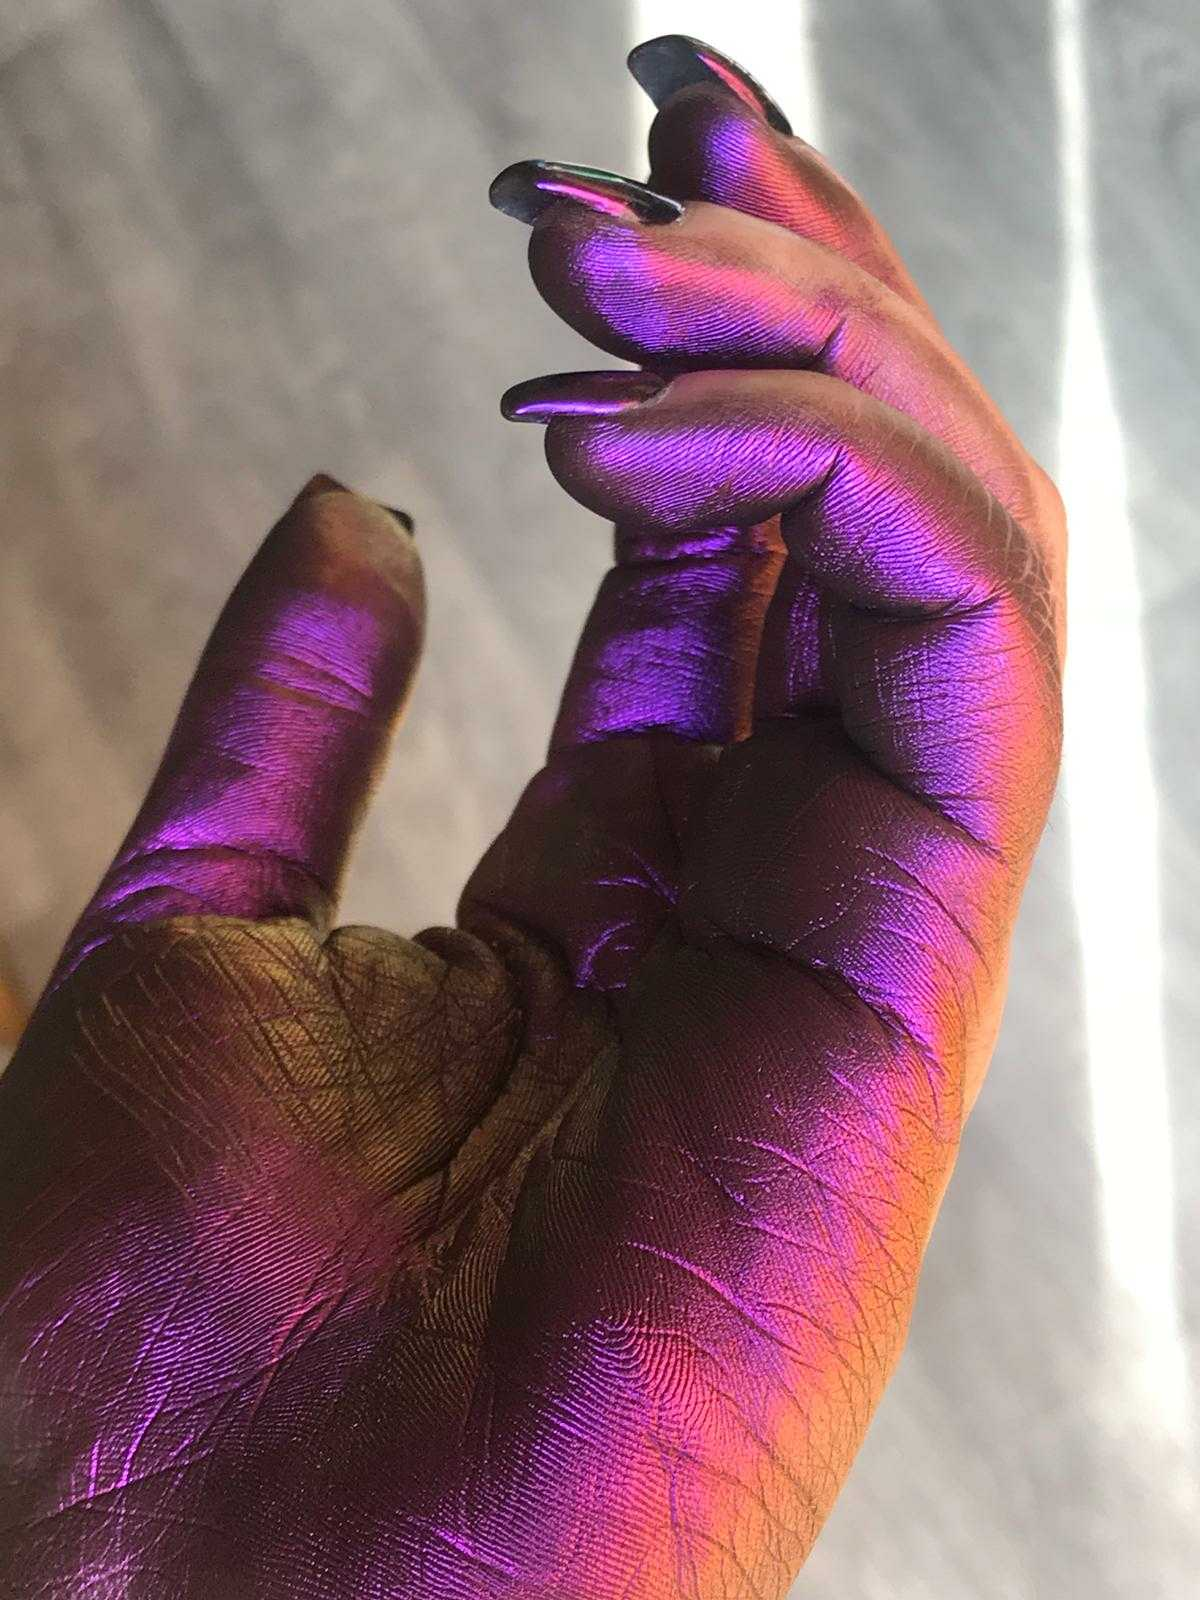 Sheenbow Eyeshadow Pigments chameleon Loose Powder